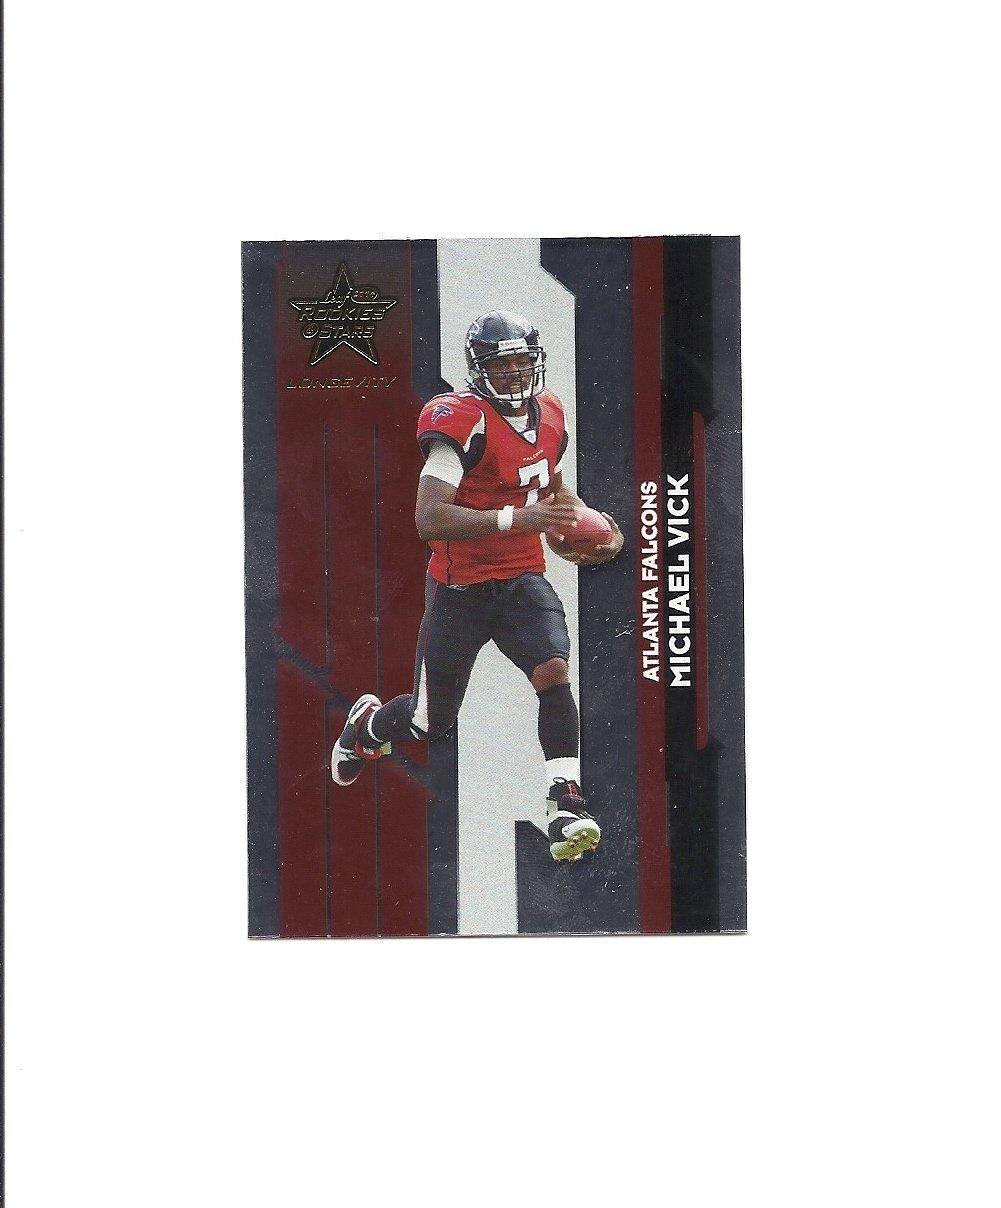 Michael Vick 2006 Leaf Rookies and Stars Longevity Card #6 Atlanta Falcons/Philadelphia Eagles